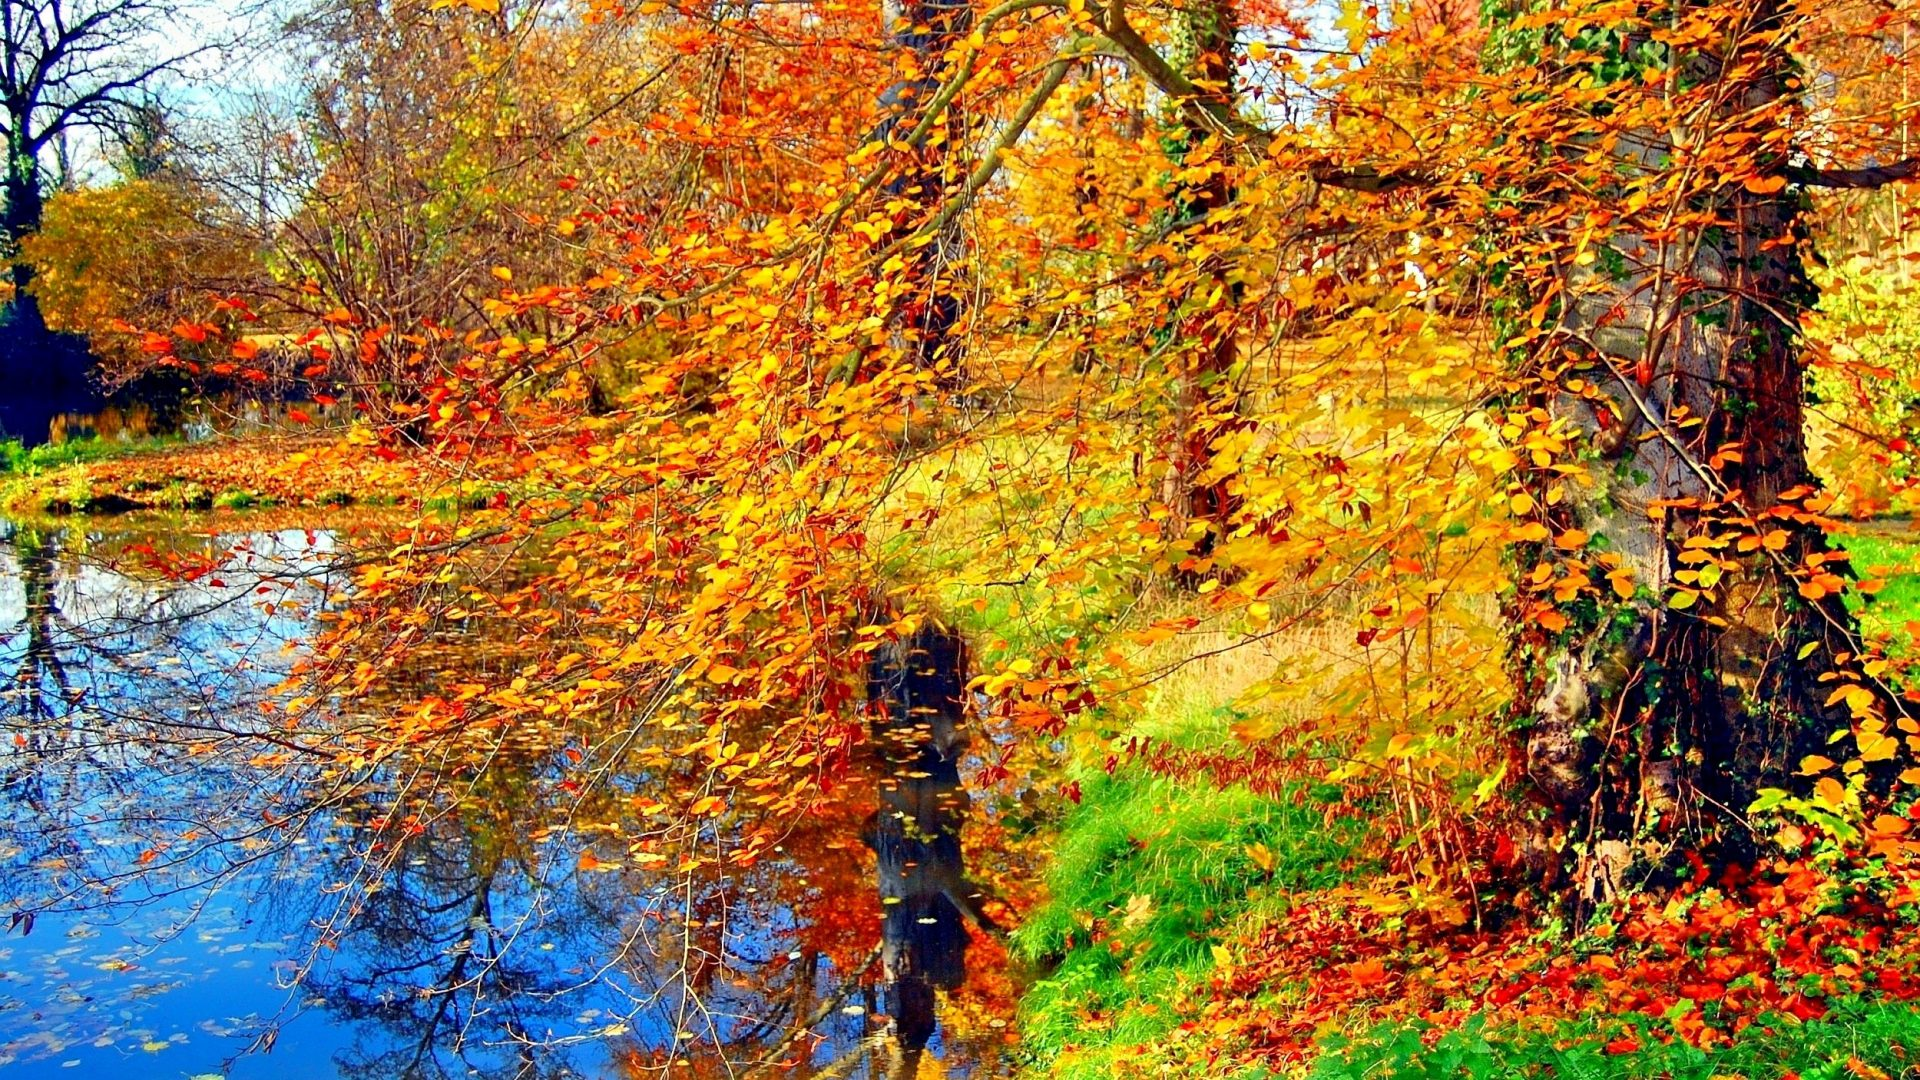 Forest Seasons Nature Splendor Autumn Green Pond Colorful - Arvores Amarelas , HD Wallpaper & Backgrounds